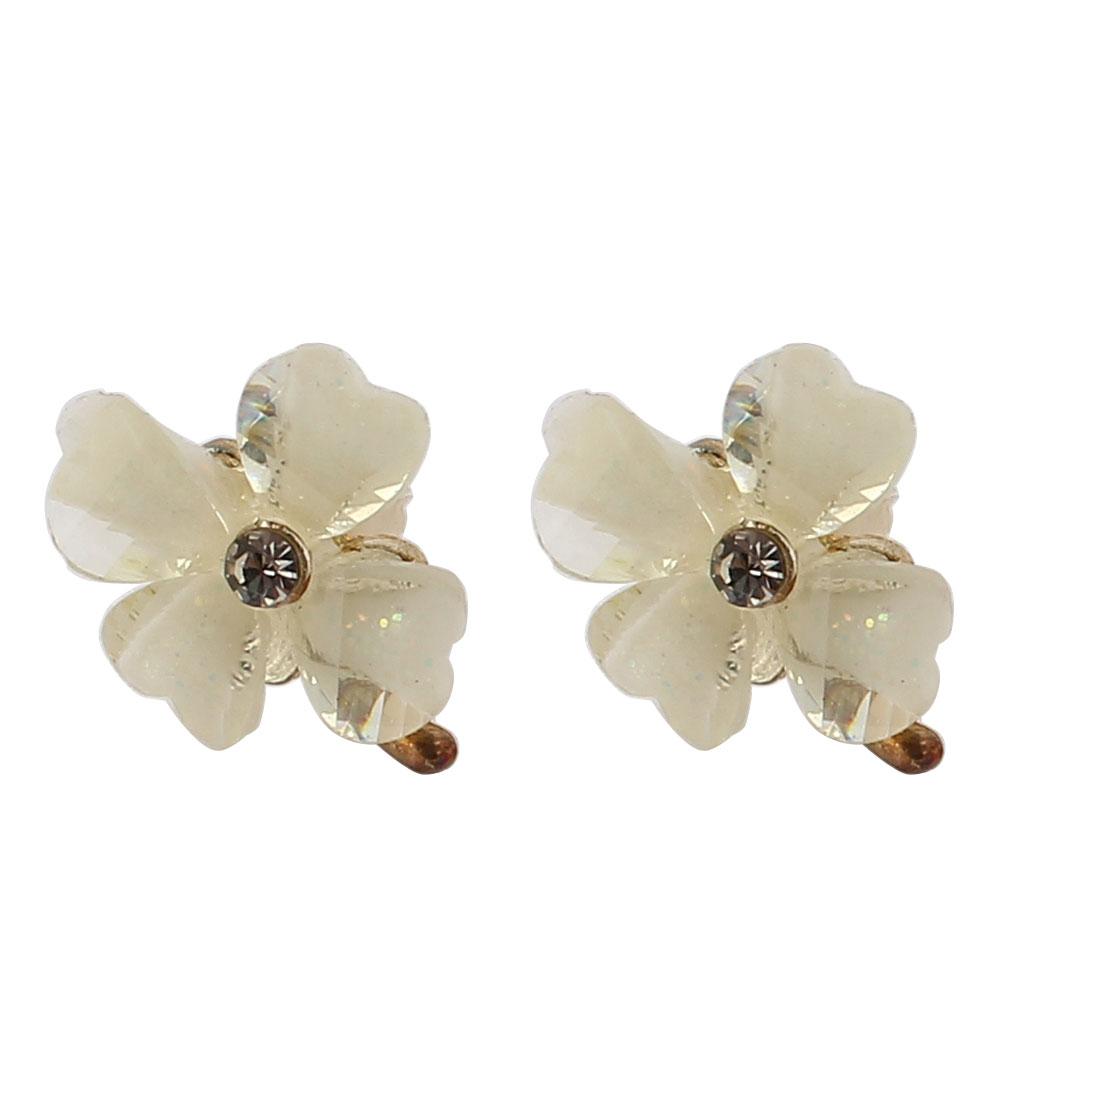 Lady Metal Dangling Ring Hexapetalous Flower Pendant Hook Earrings Red Pair